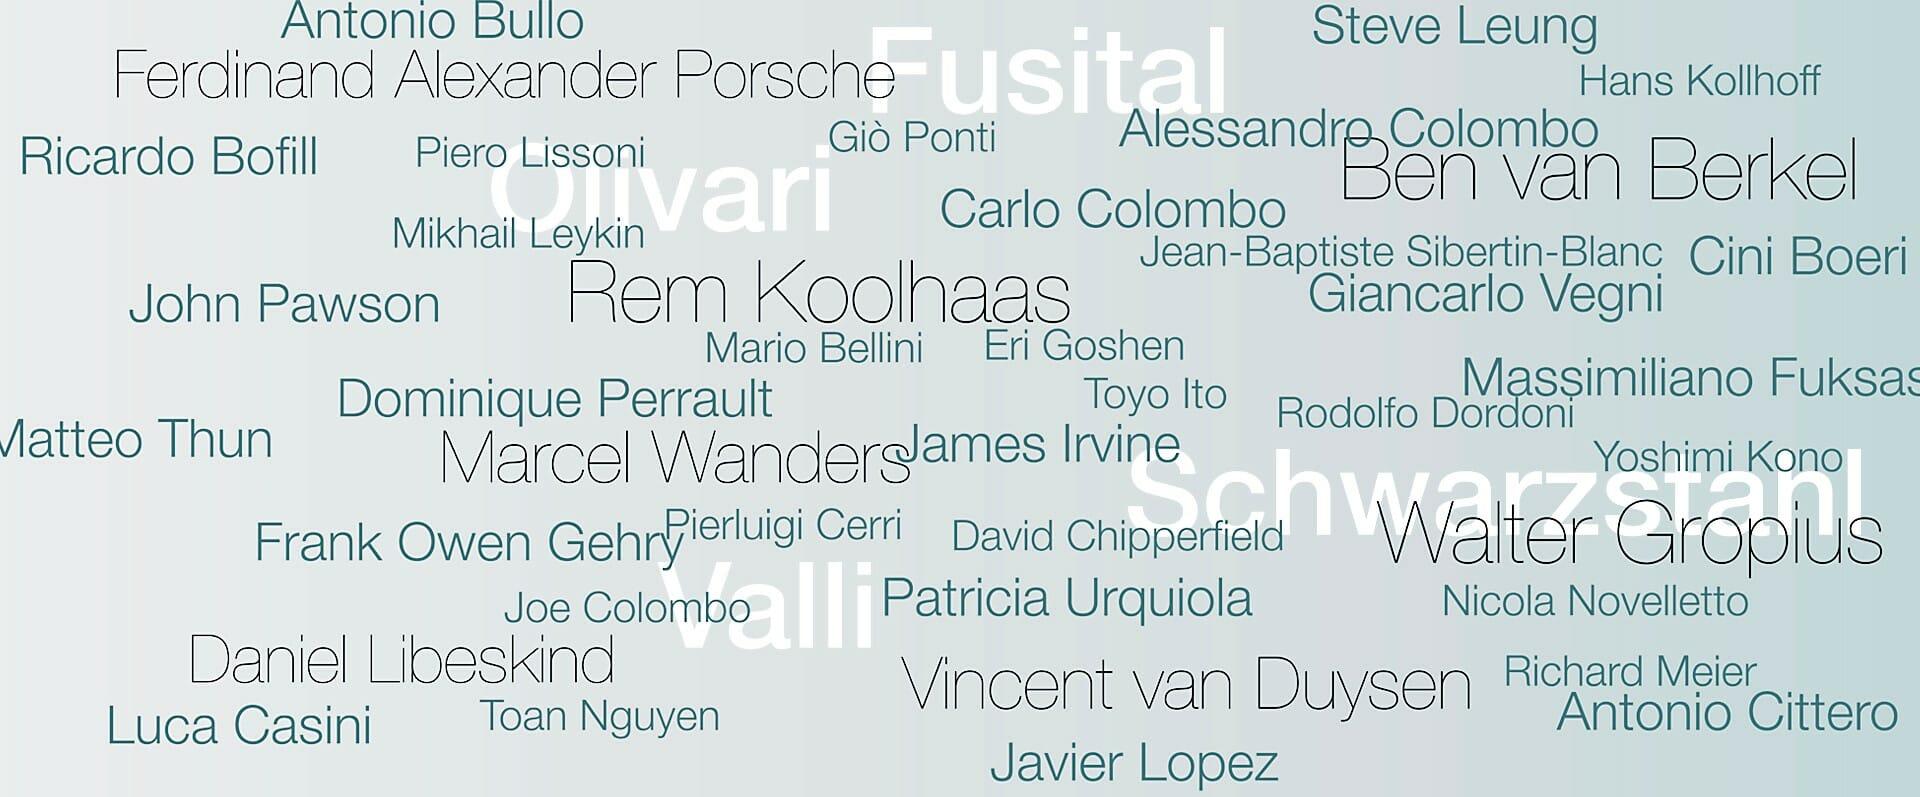 Wereldberoemde designers en ontwerpers